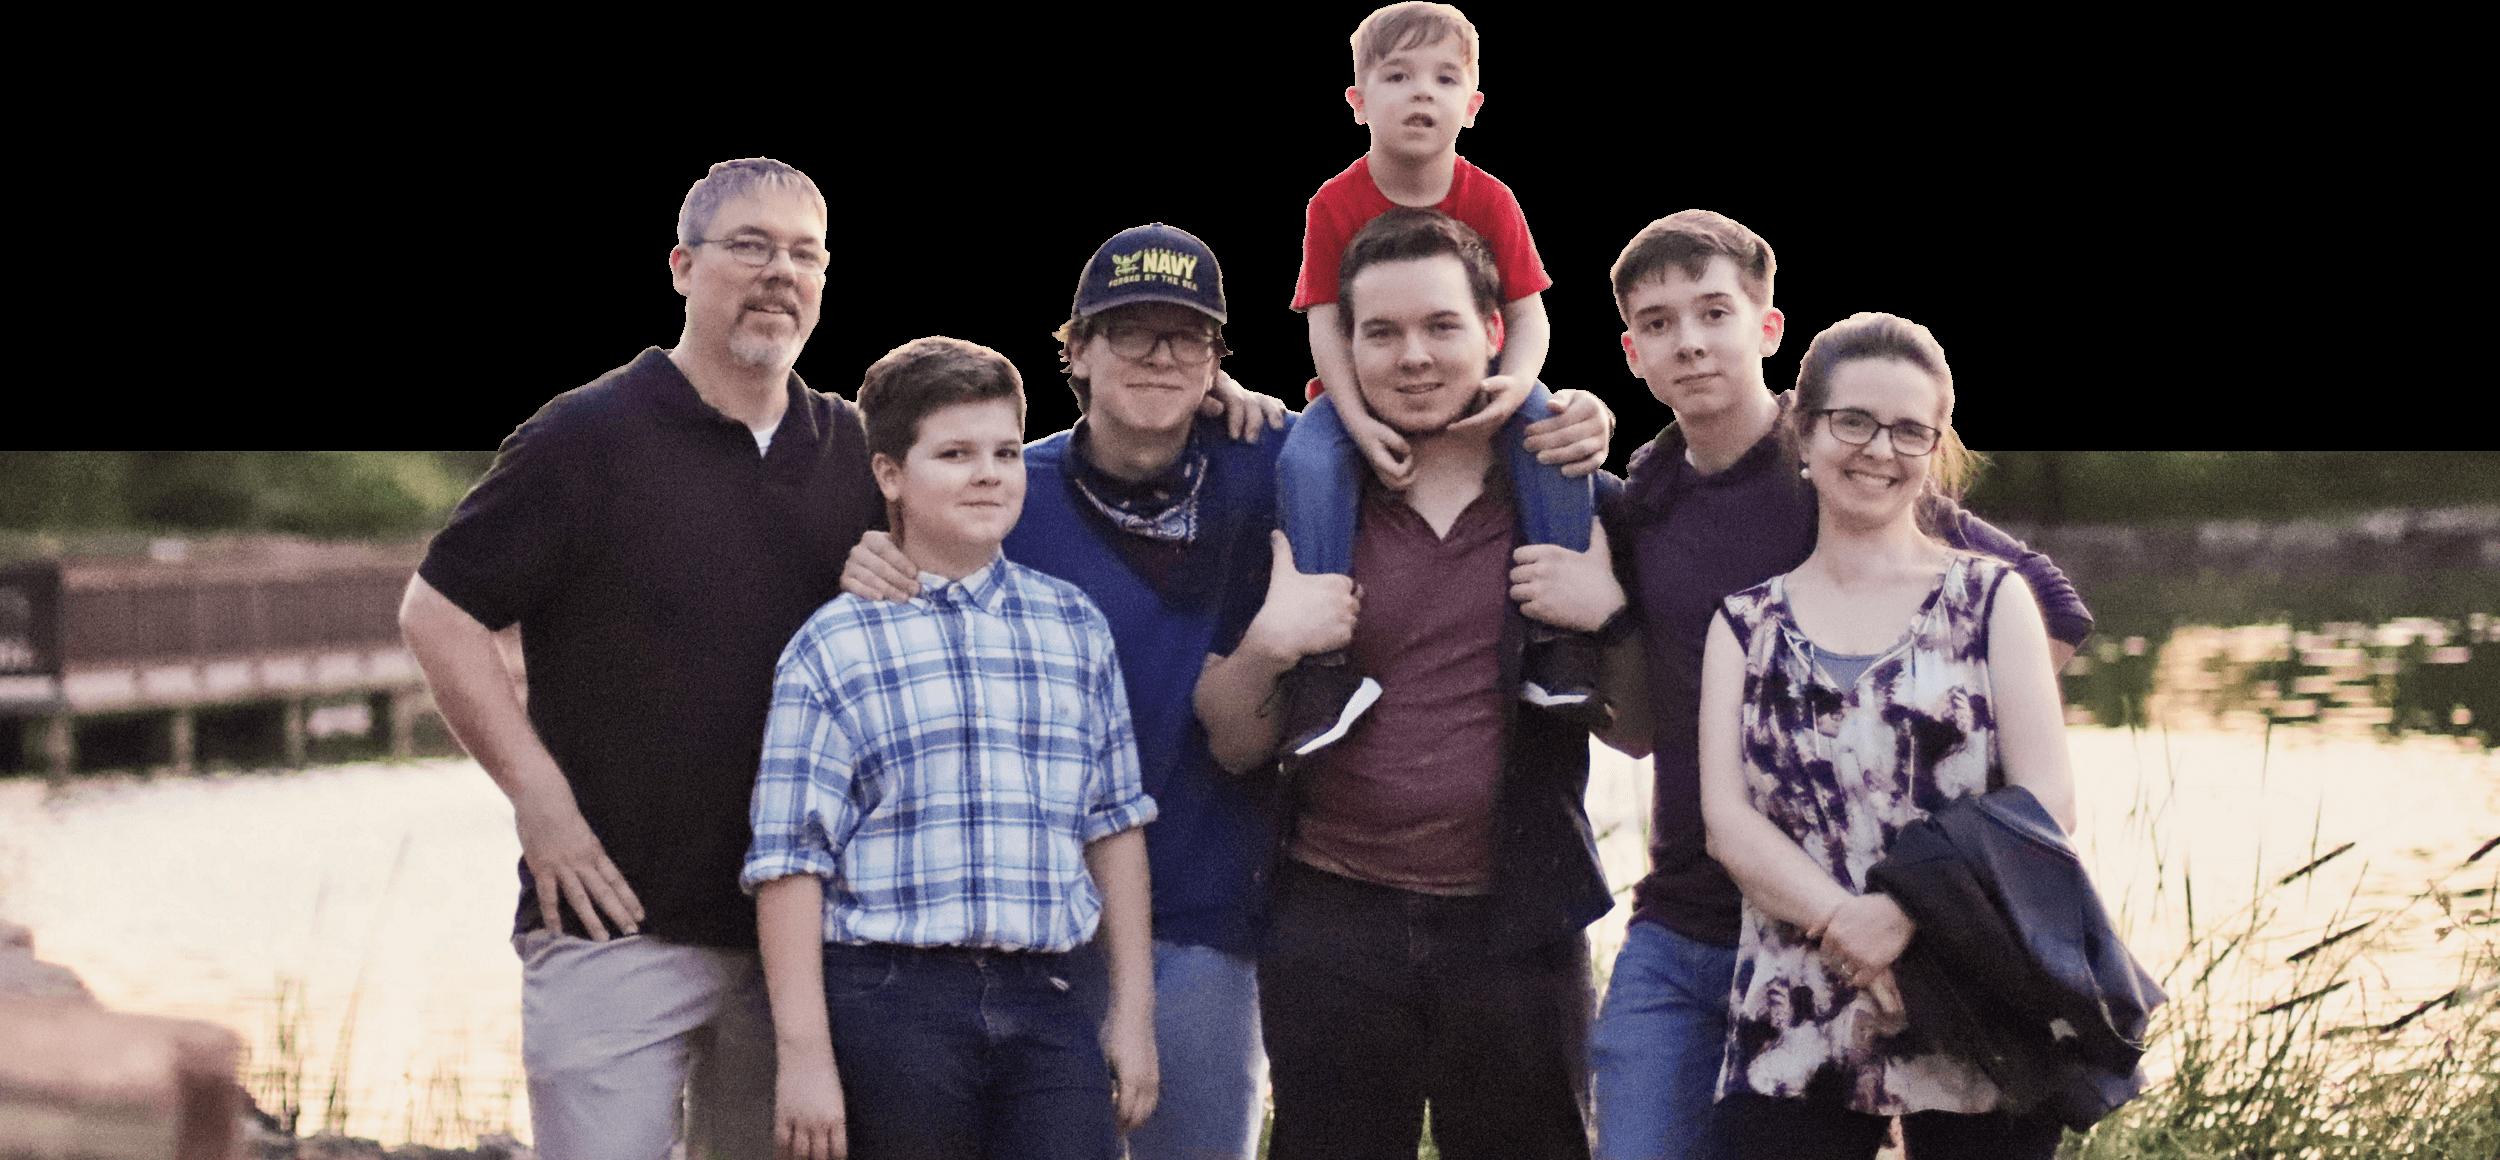 Prescott Family standing together